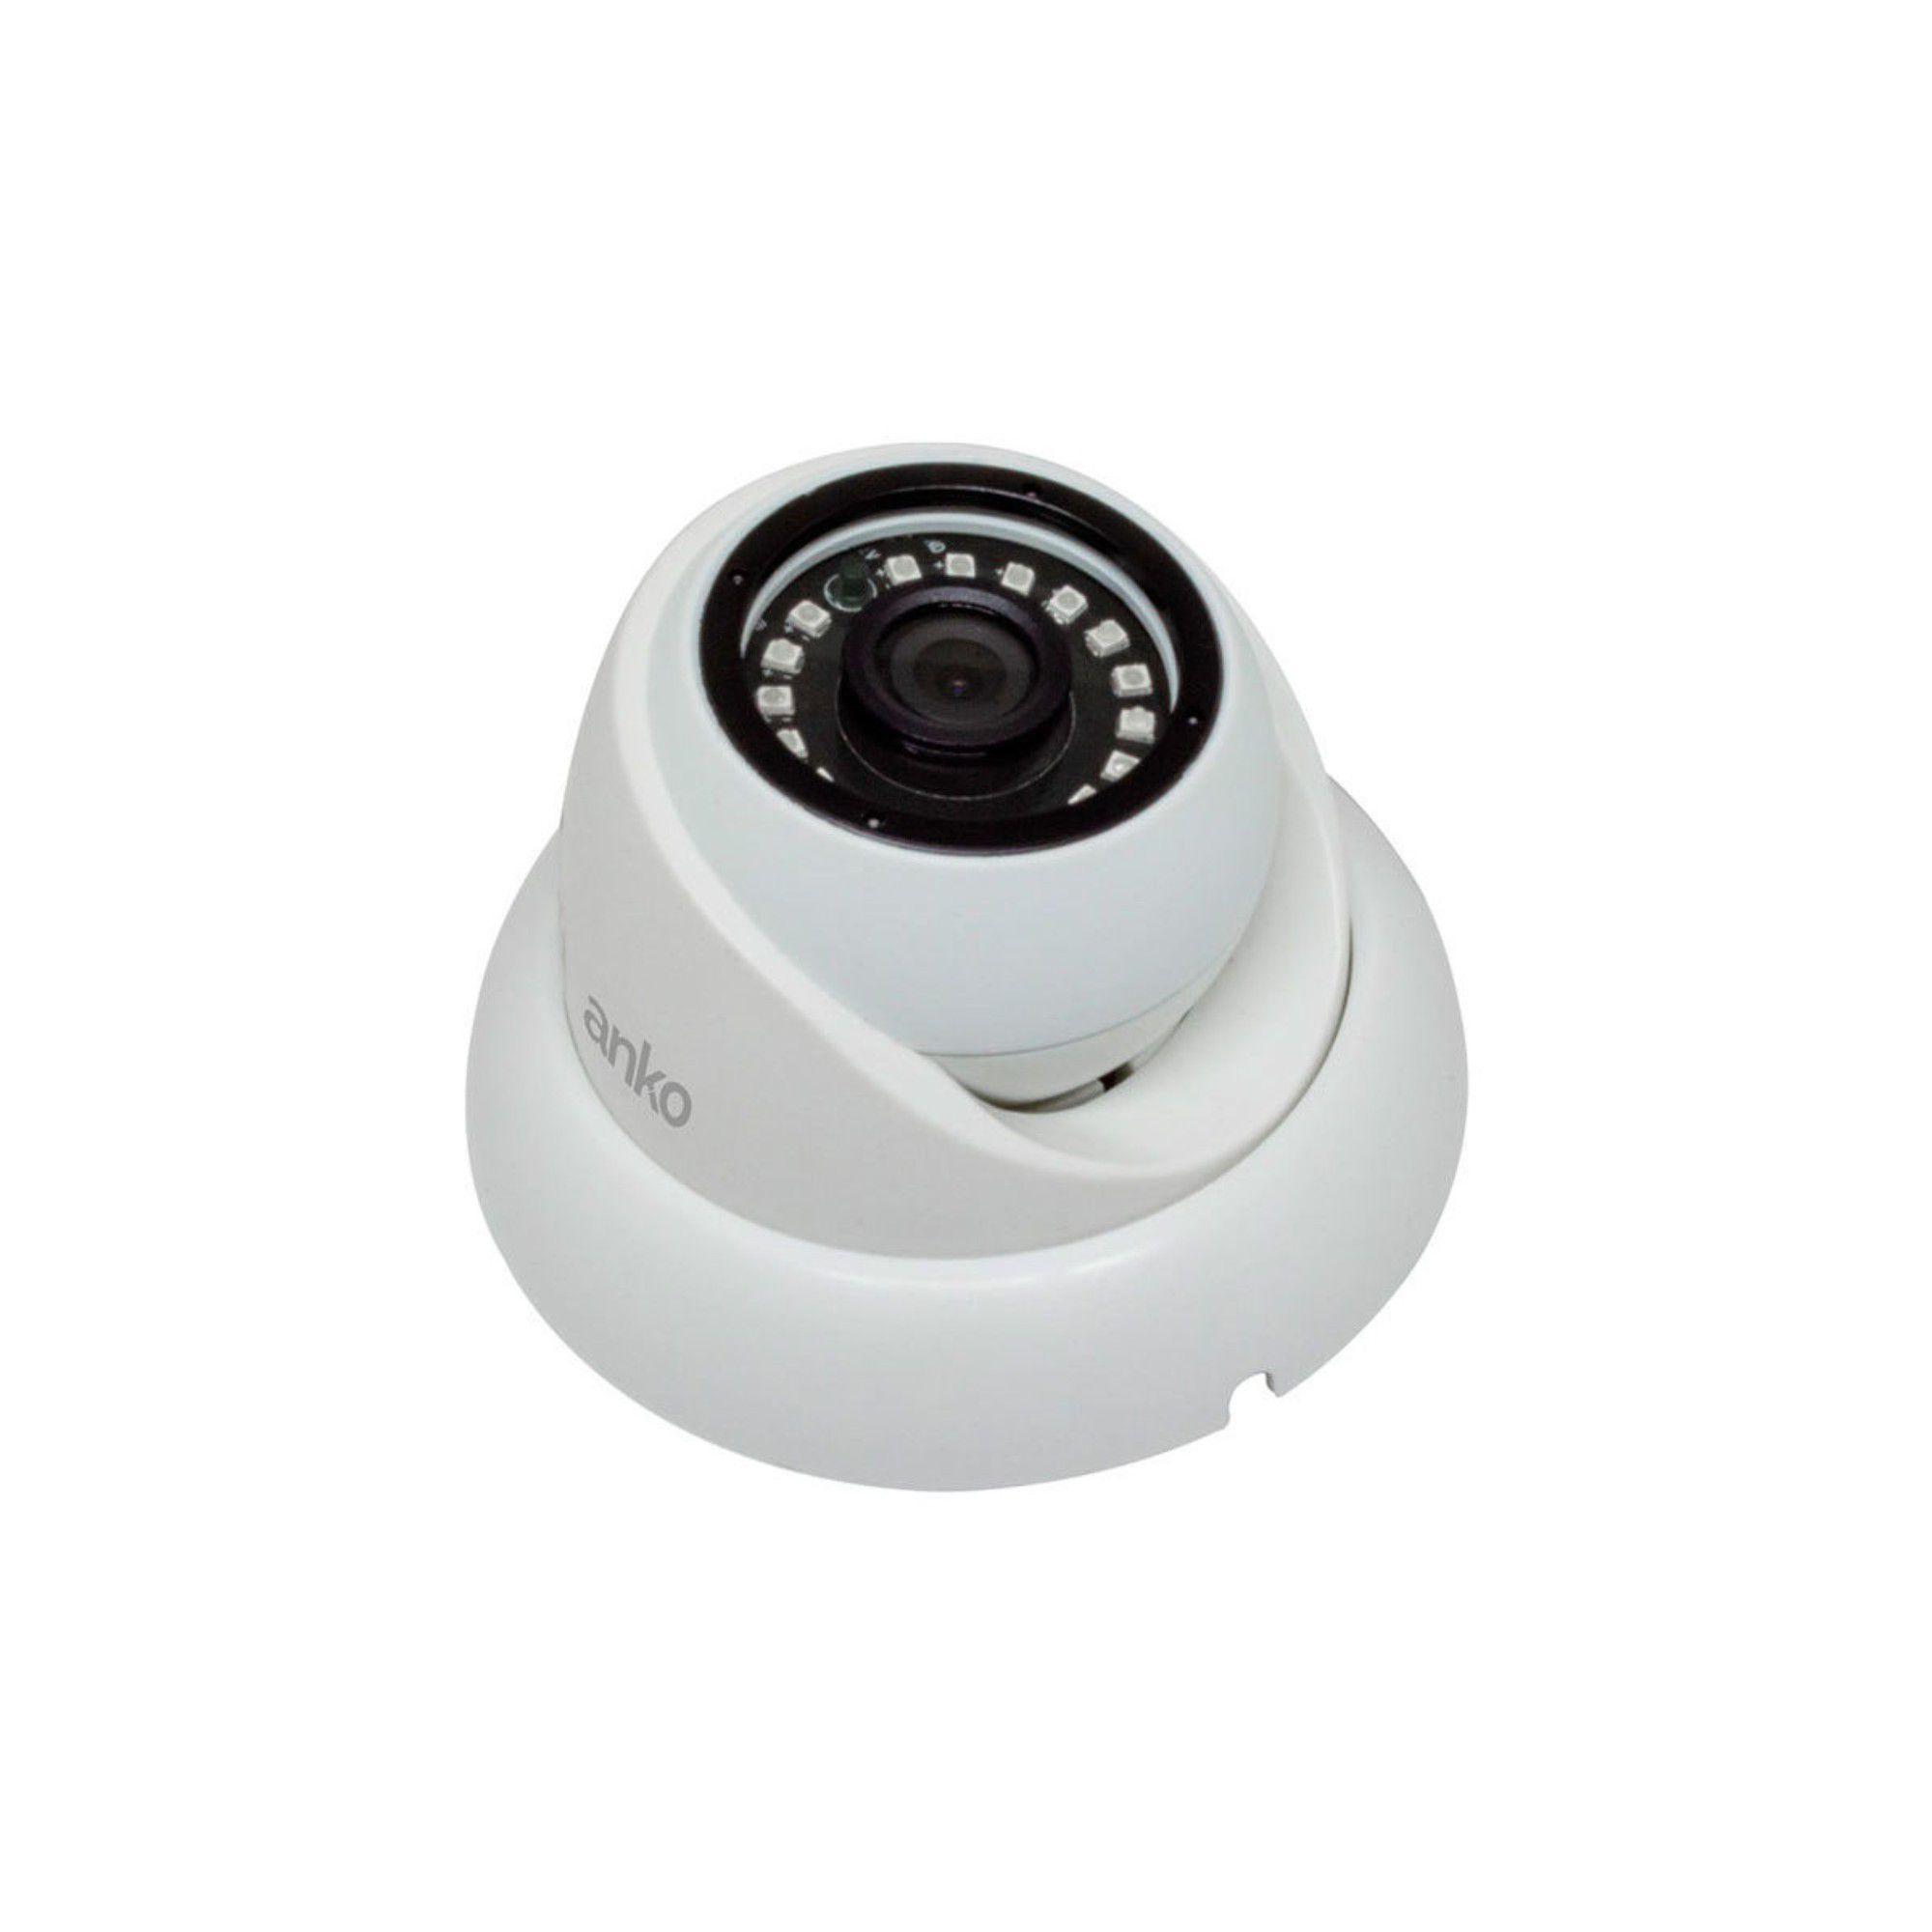 Câmera Infra Dome ANKO Full HD 4 em 1 (AHD, HDCVI, HDTVI e ANALÓGICA) LENTE 2,8MM